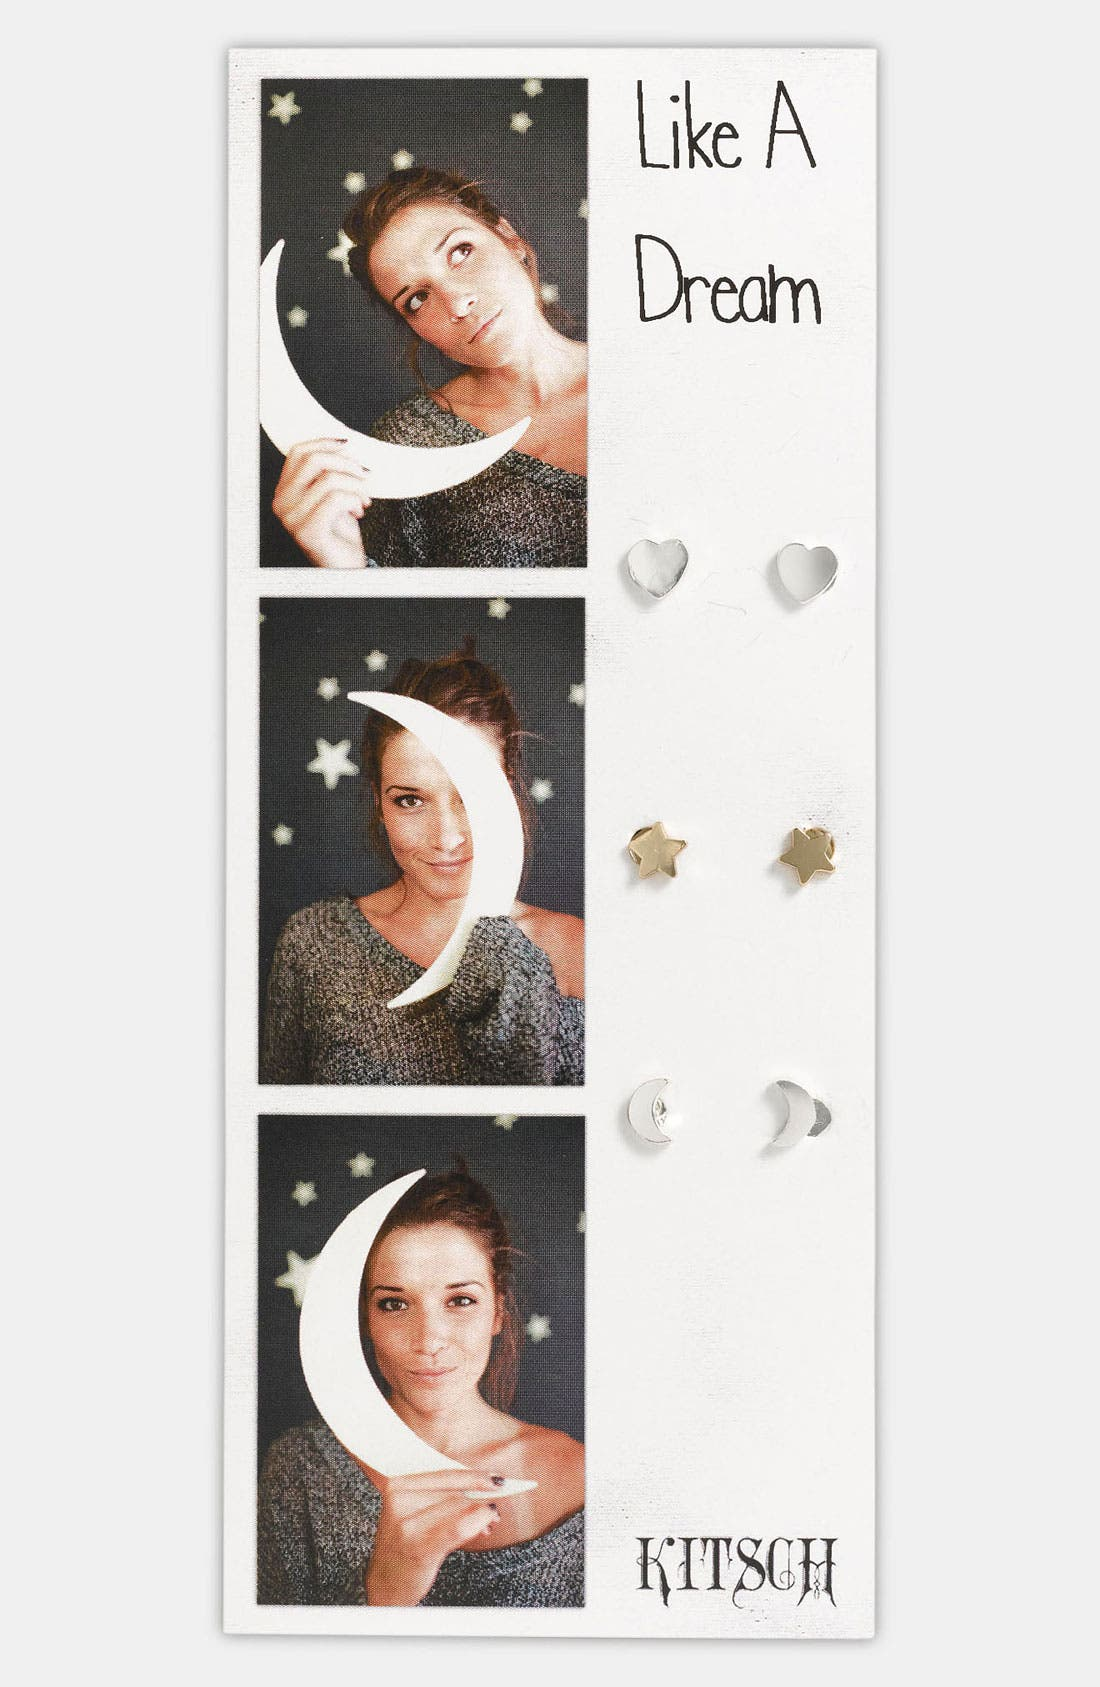 Alternate Image 1 Selected - Kitsch 'Like a Dream' Earrings (Set of 3)